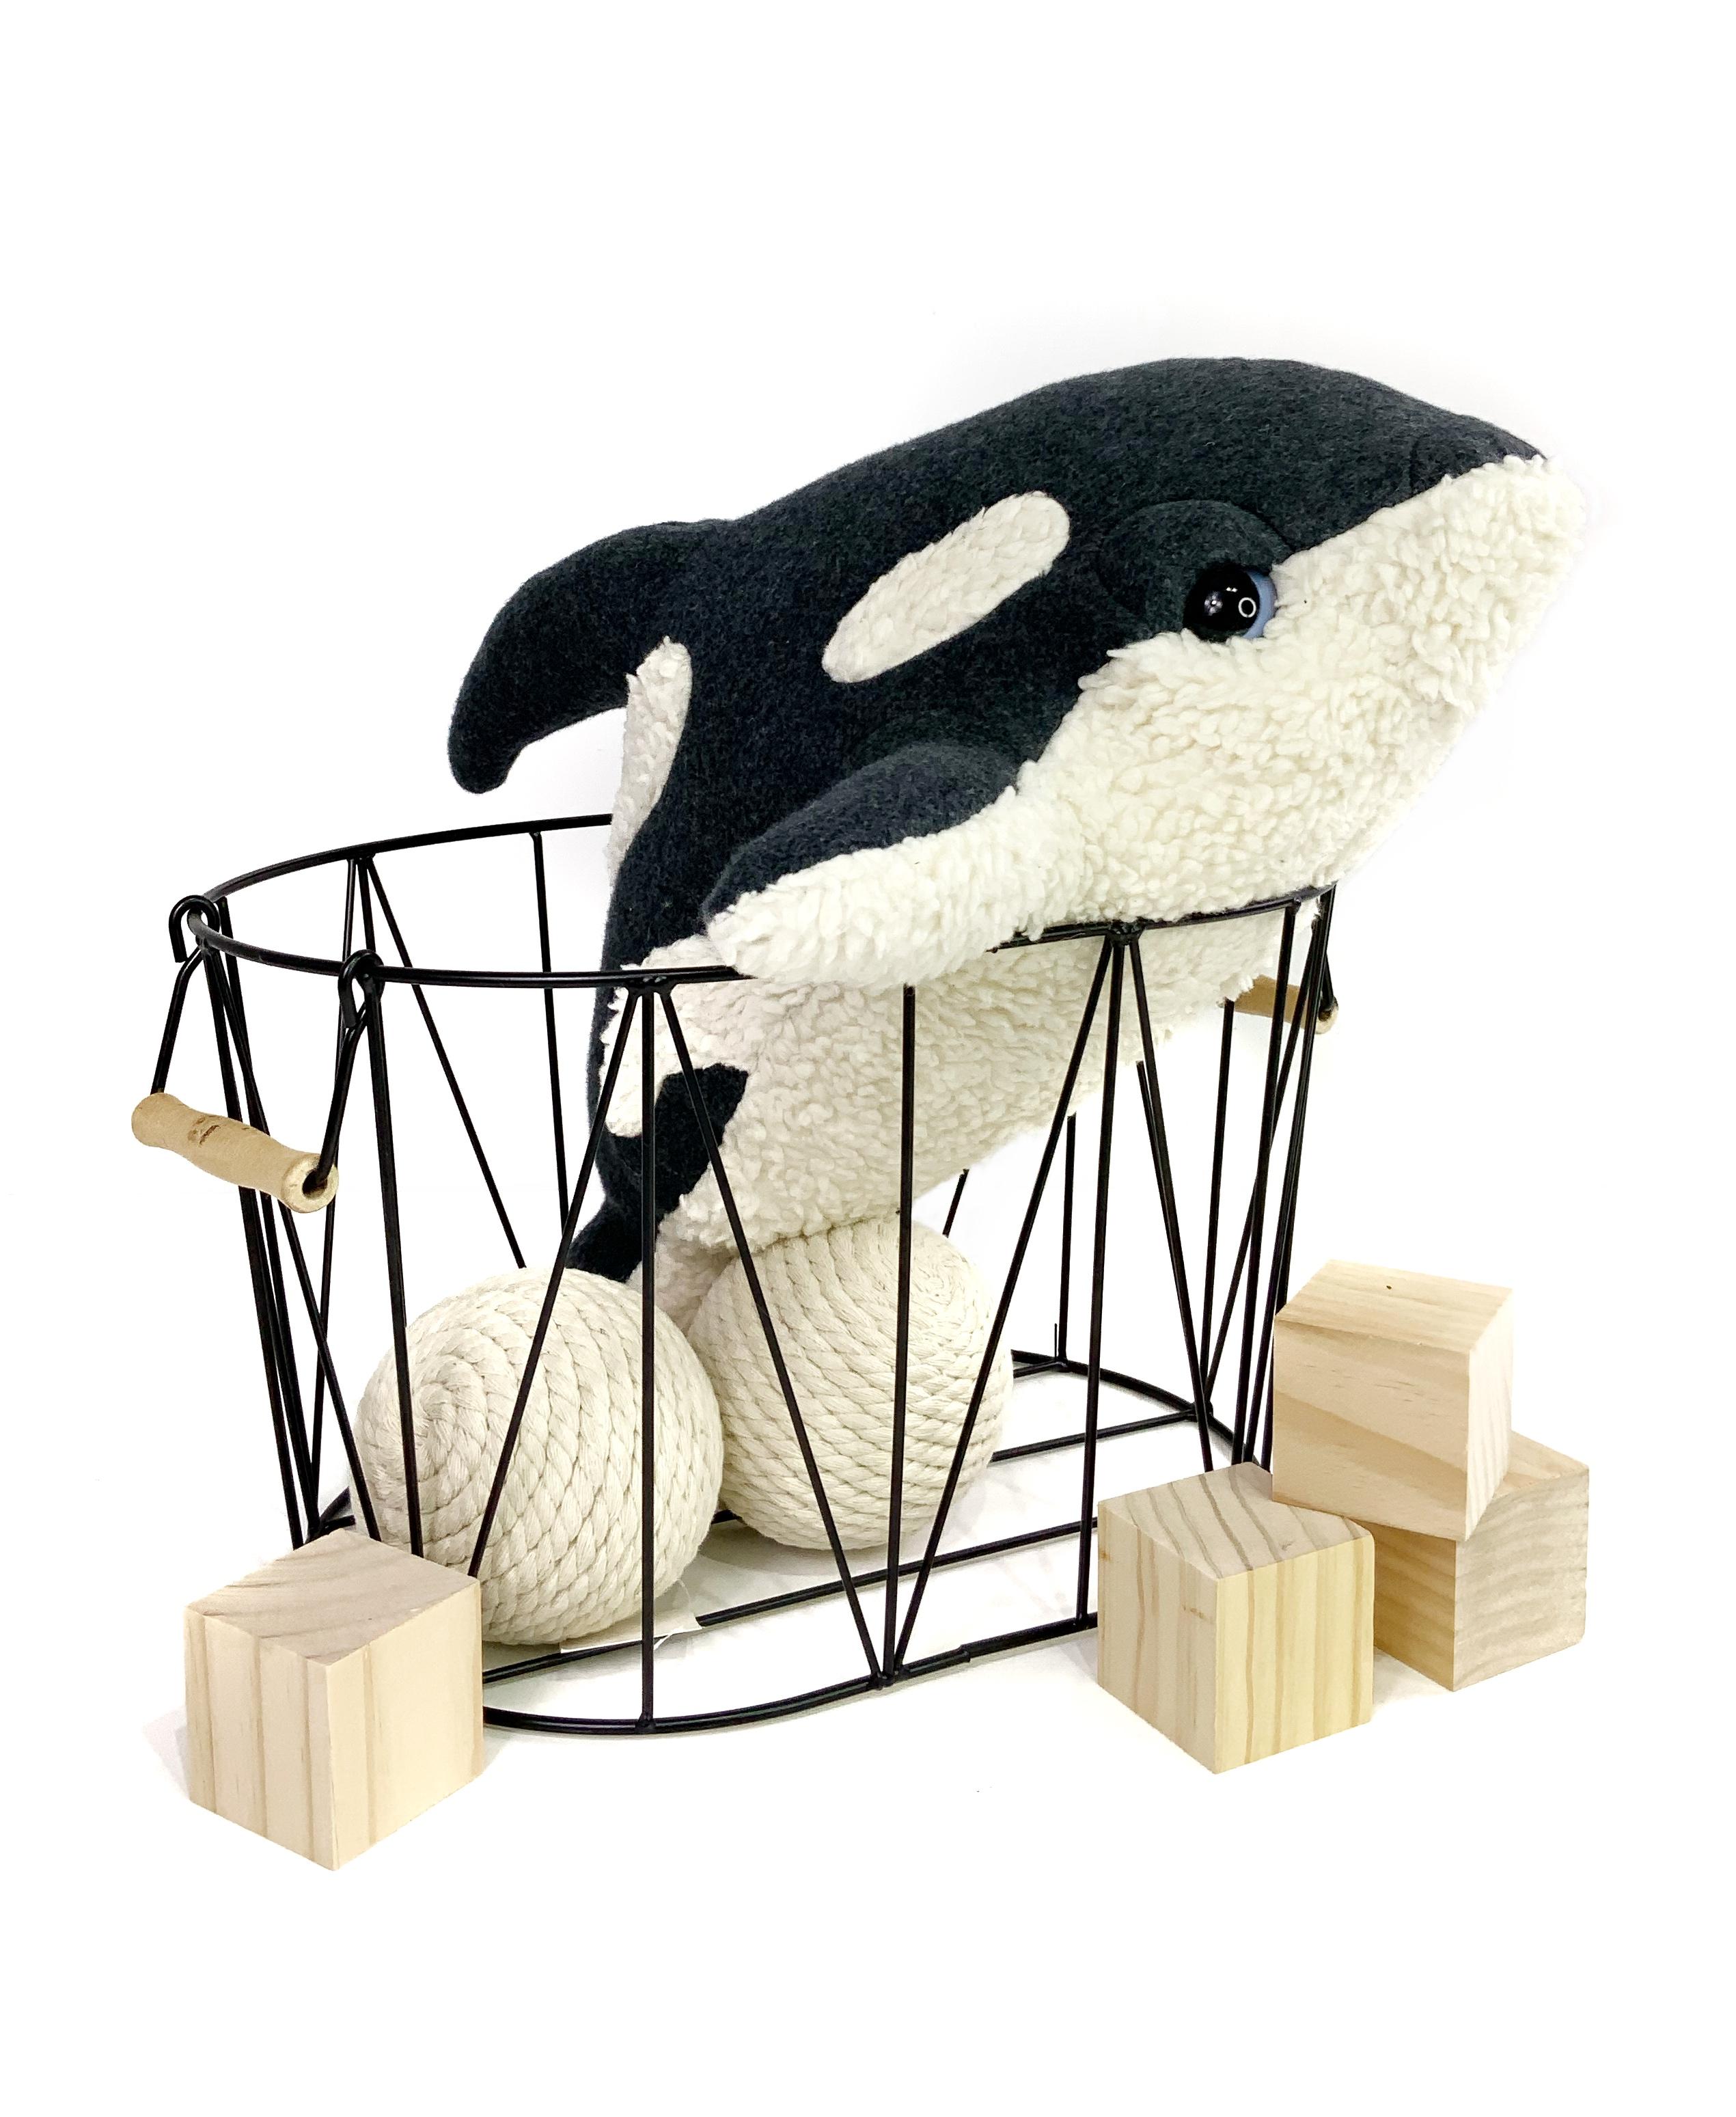 Little Killer Whale Plush - Handmade Organic Baby Orca Plushie